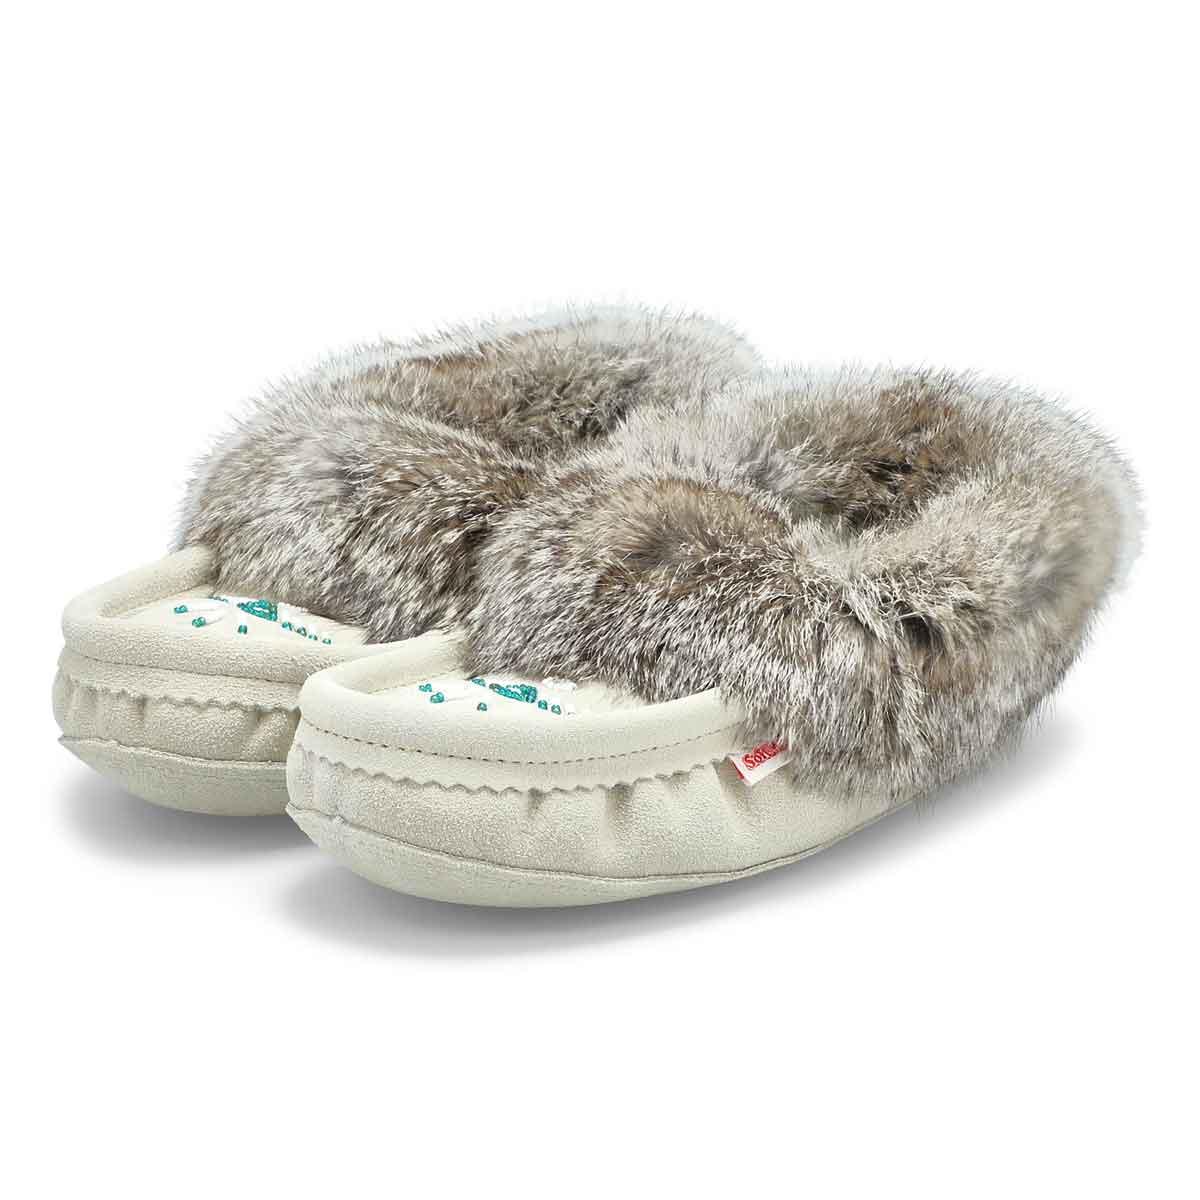 Women's SF652-IC Rabbit Fur Moccasin - Ice